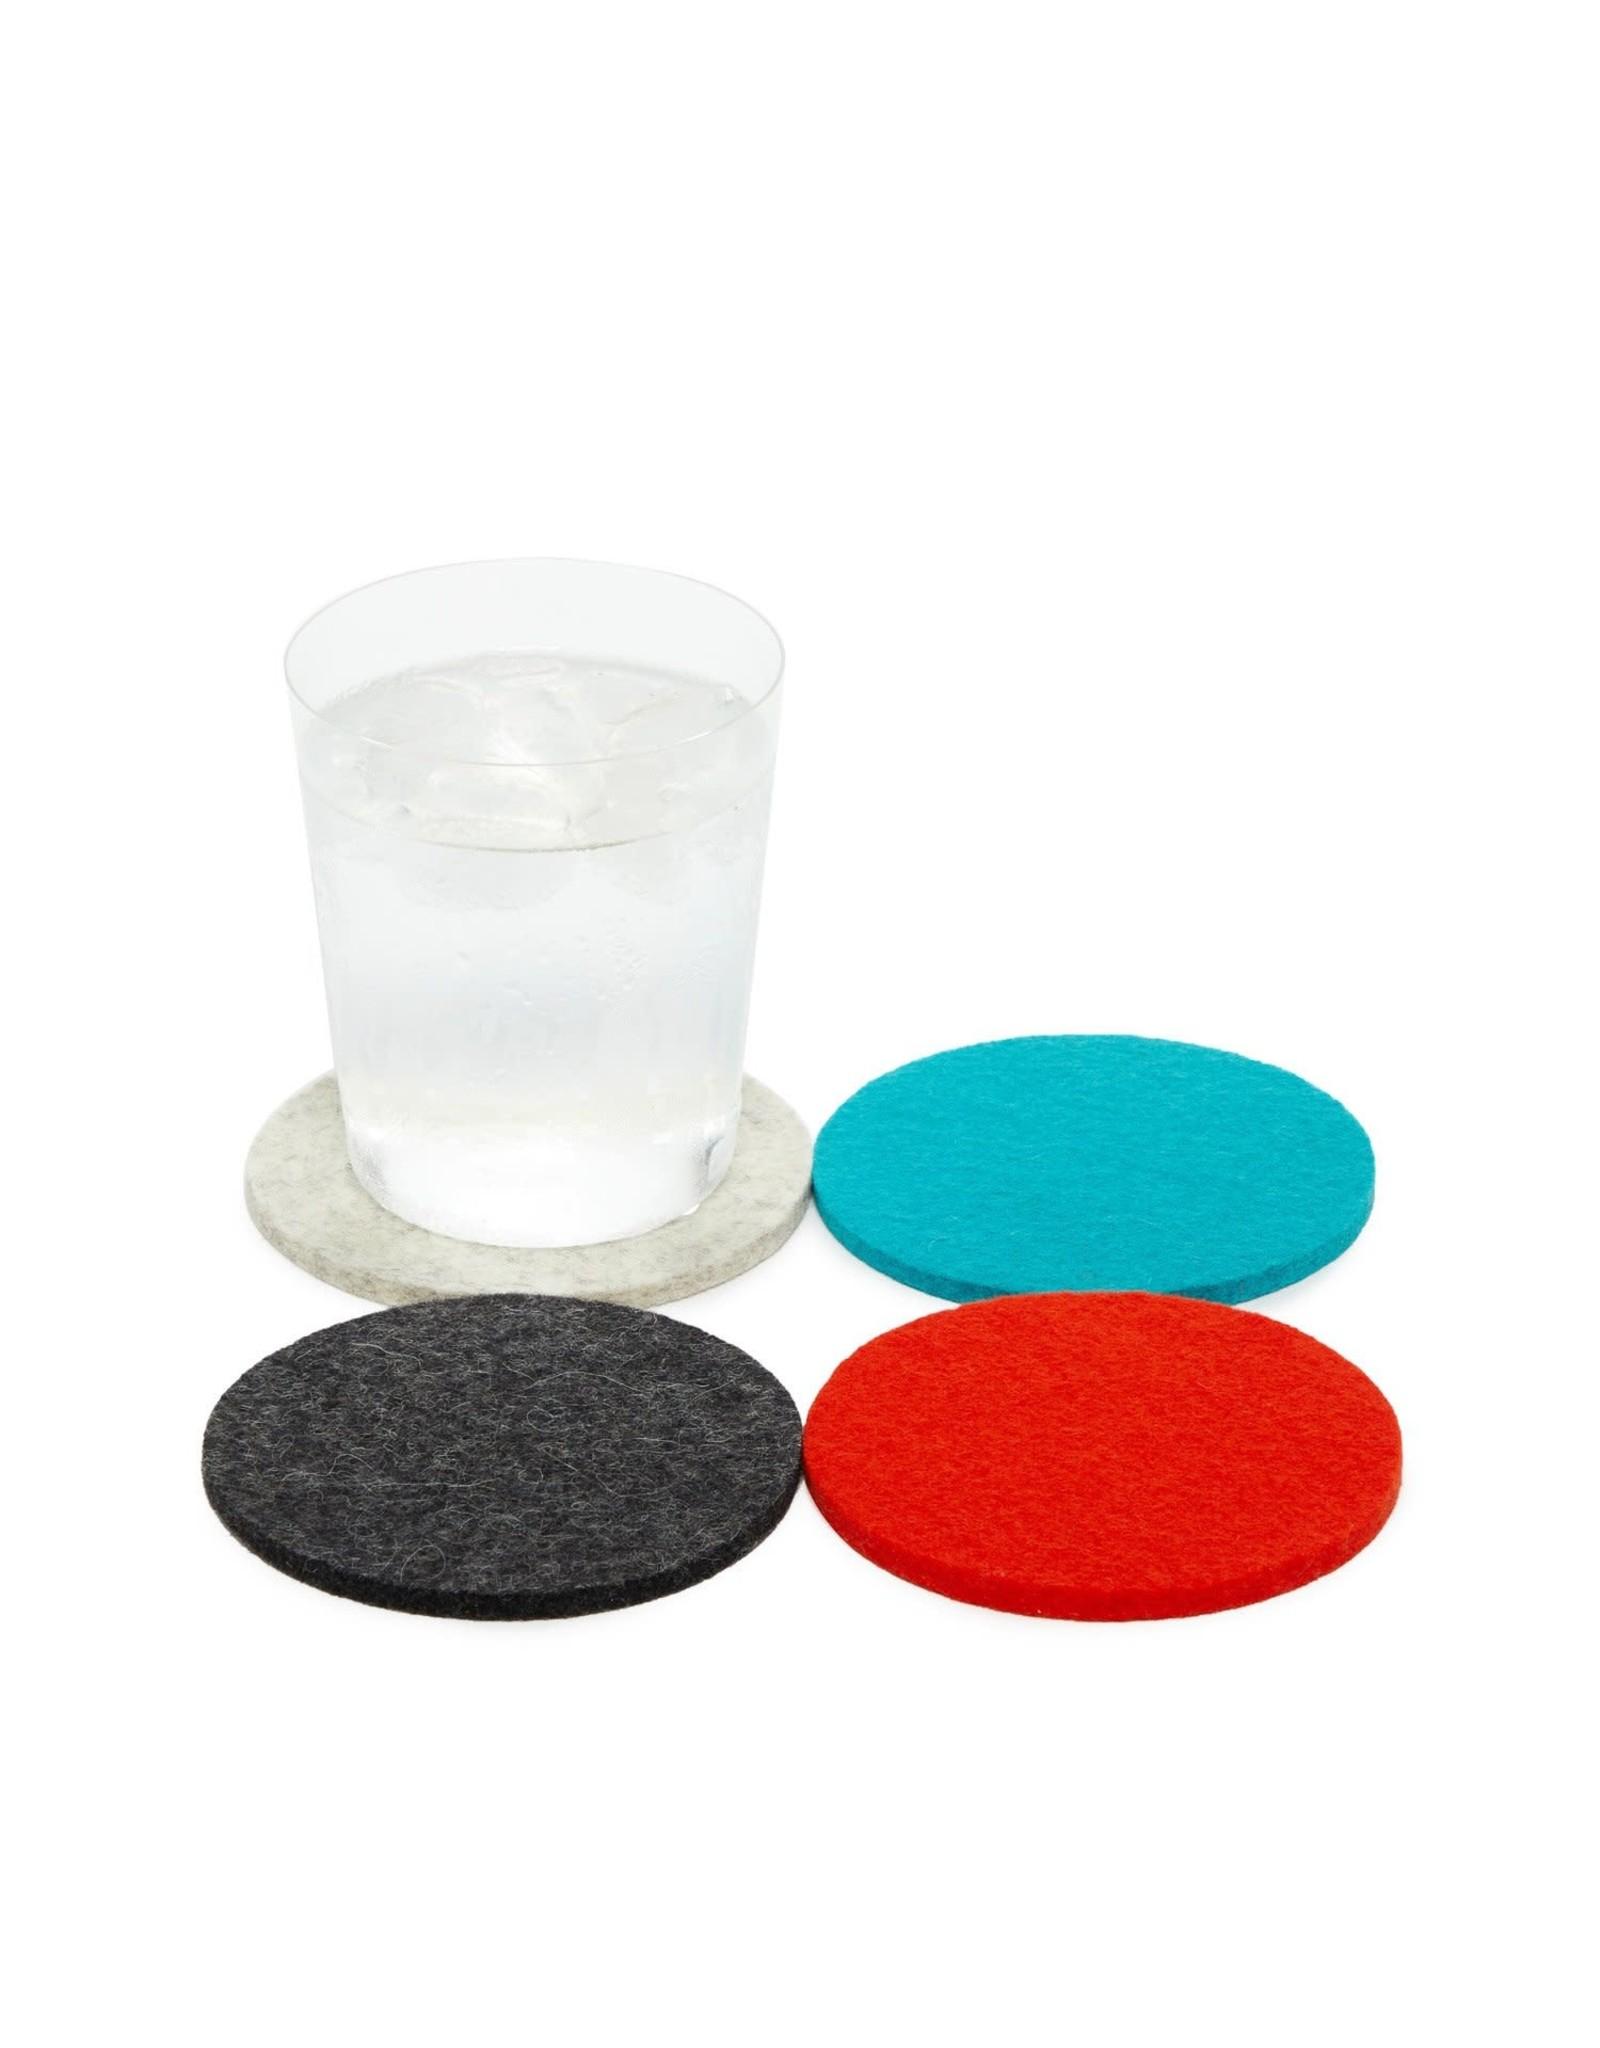 Bierfilzl Round Multi Color Felt Coaster in Midcentury